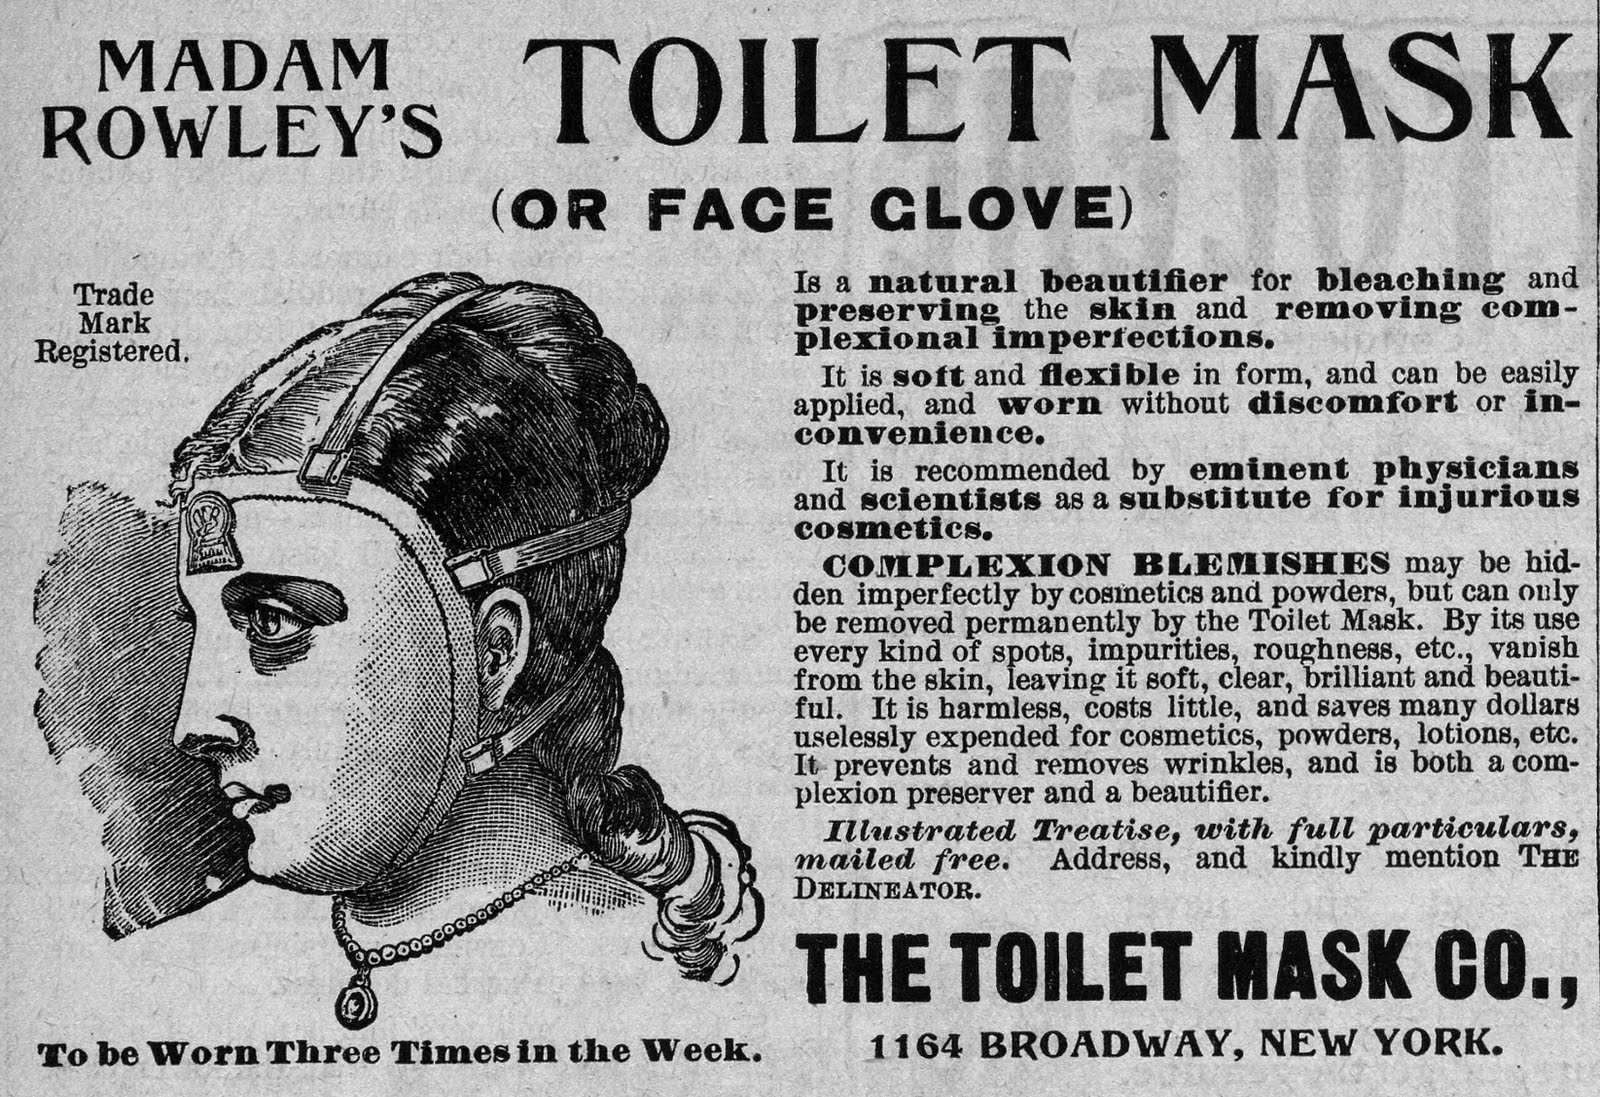 madame-rowleys-toilet-mask.jpg